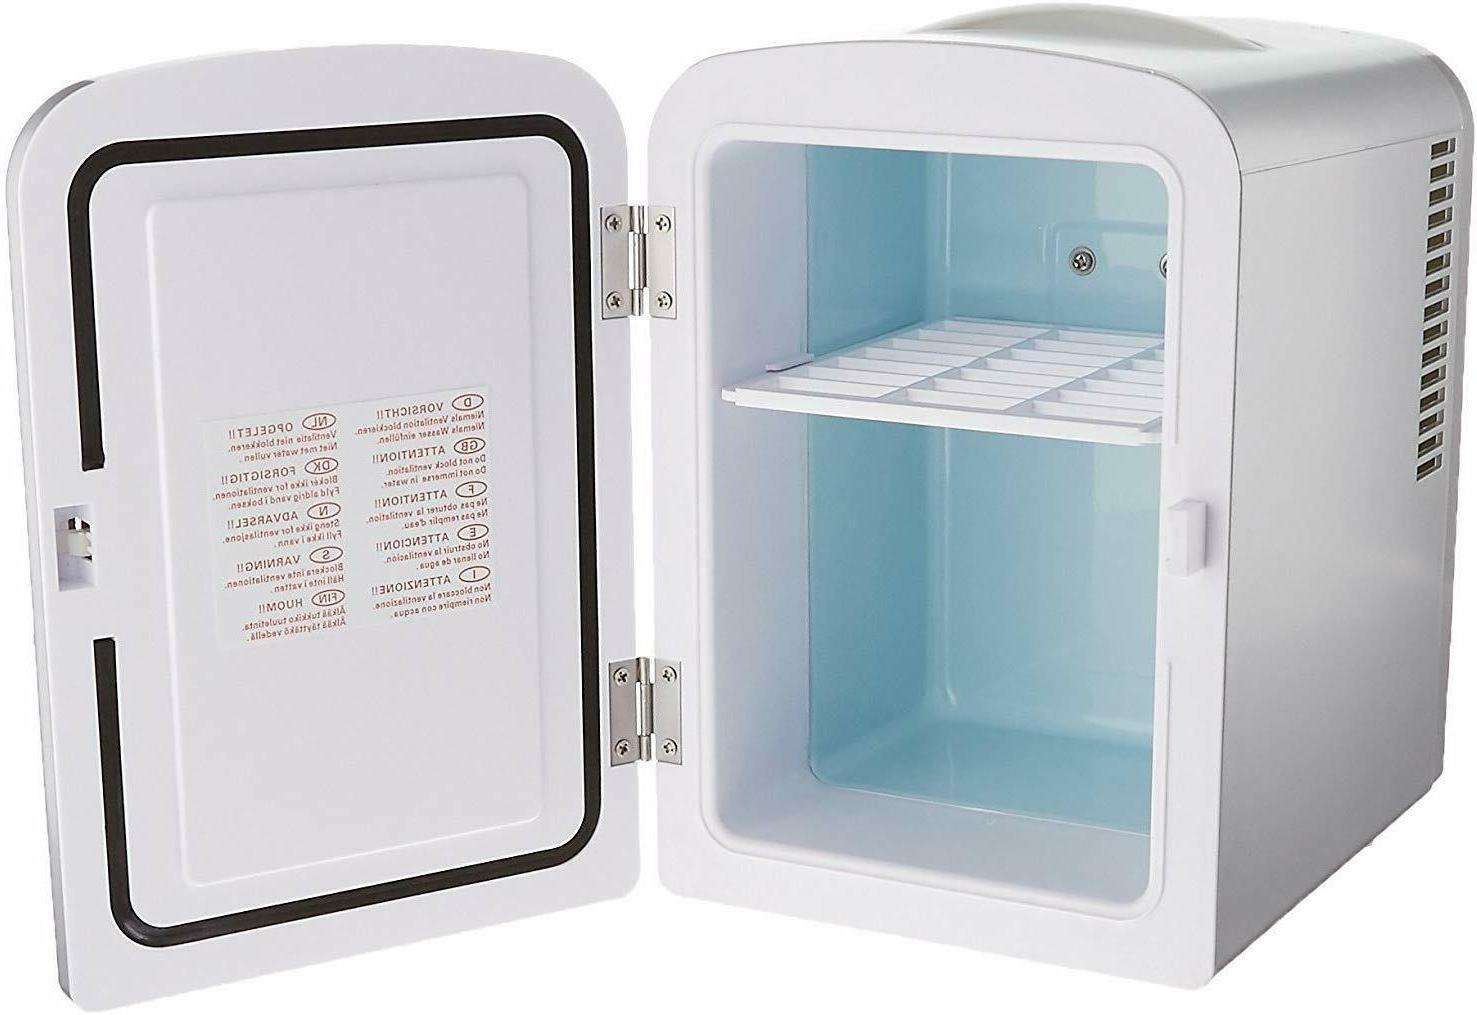 Portable Small Compact Fridge Refrigerator Cooler & Warmer D